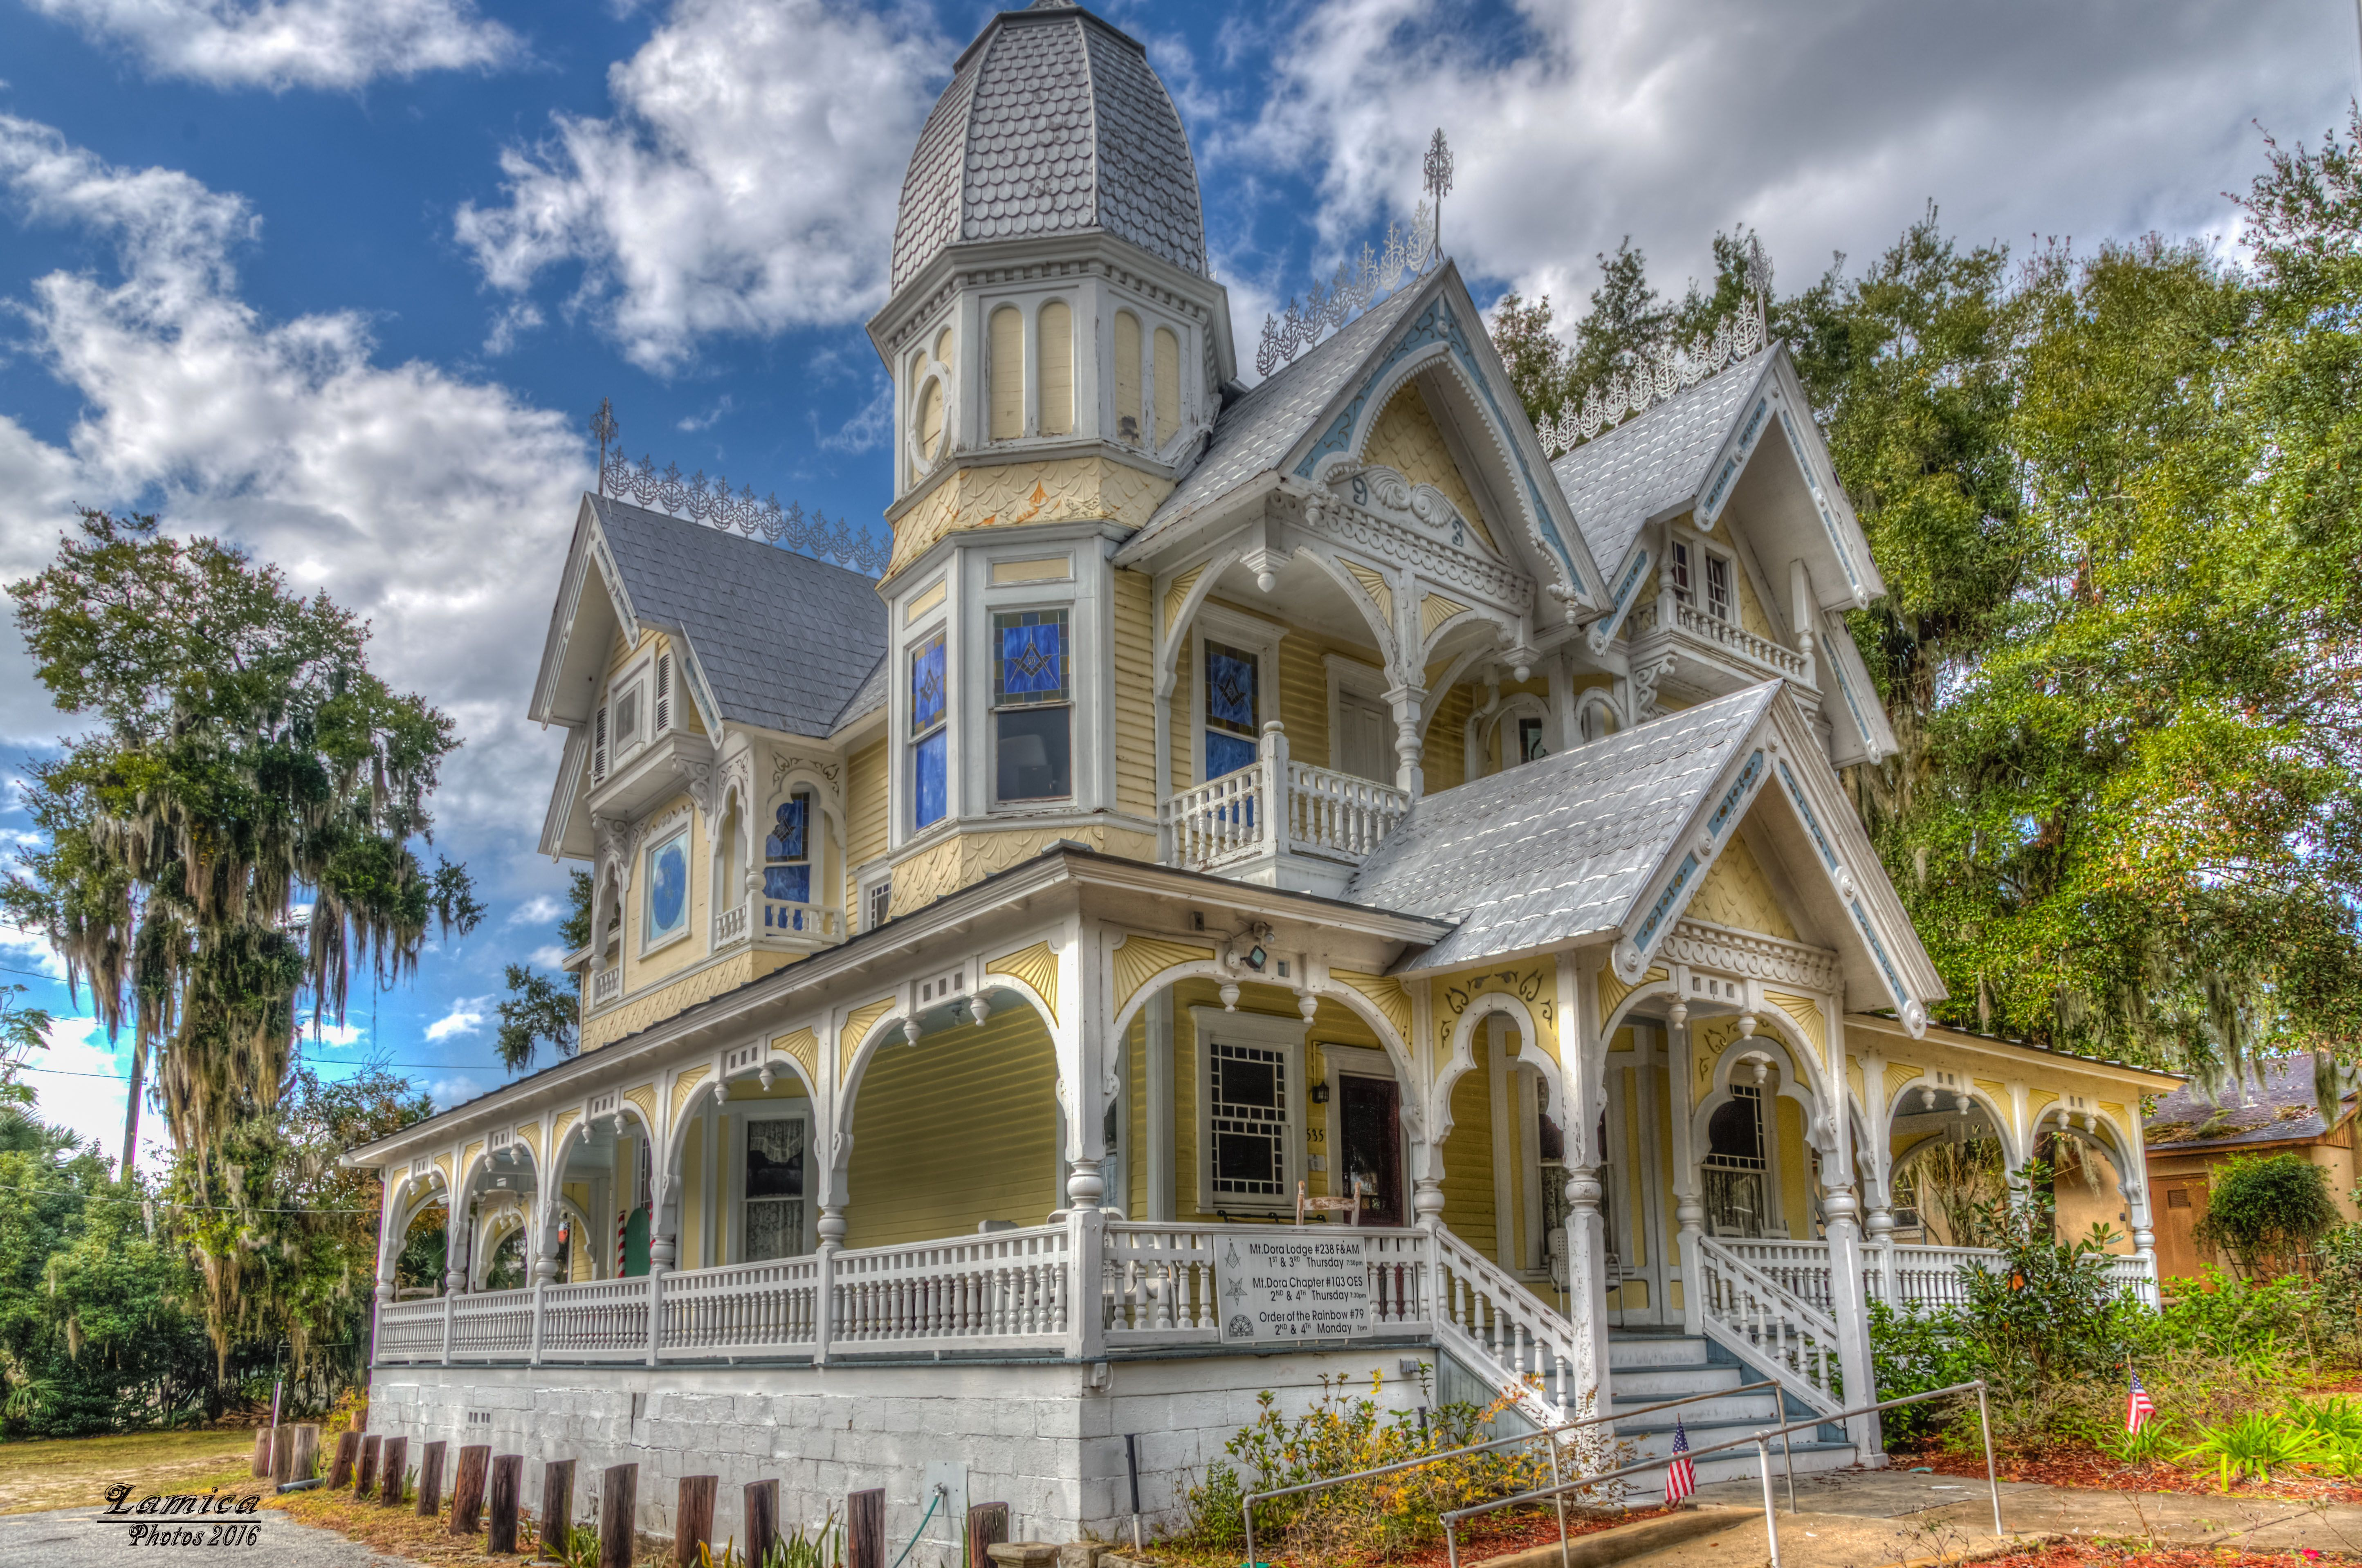 Old House in Mt. Dora Fl | HDR creme